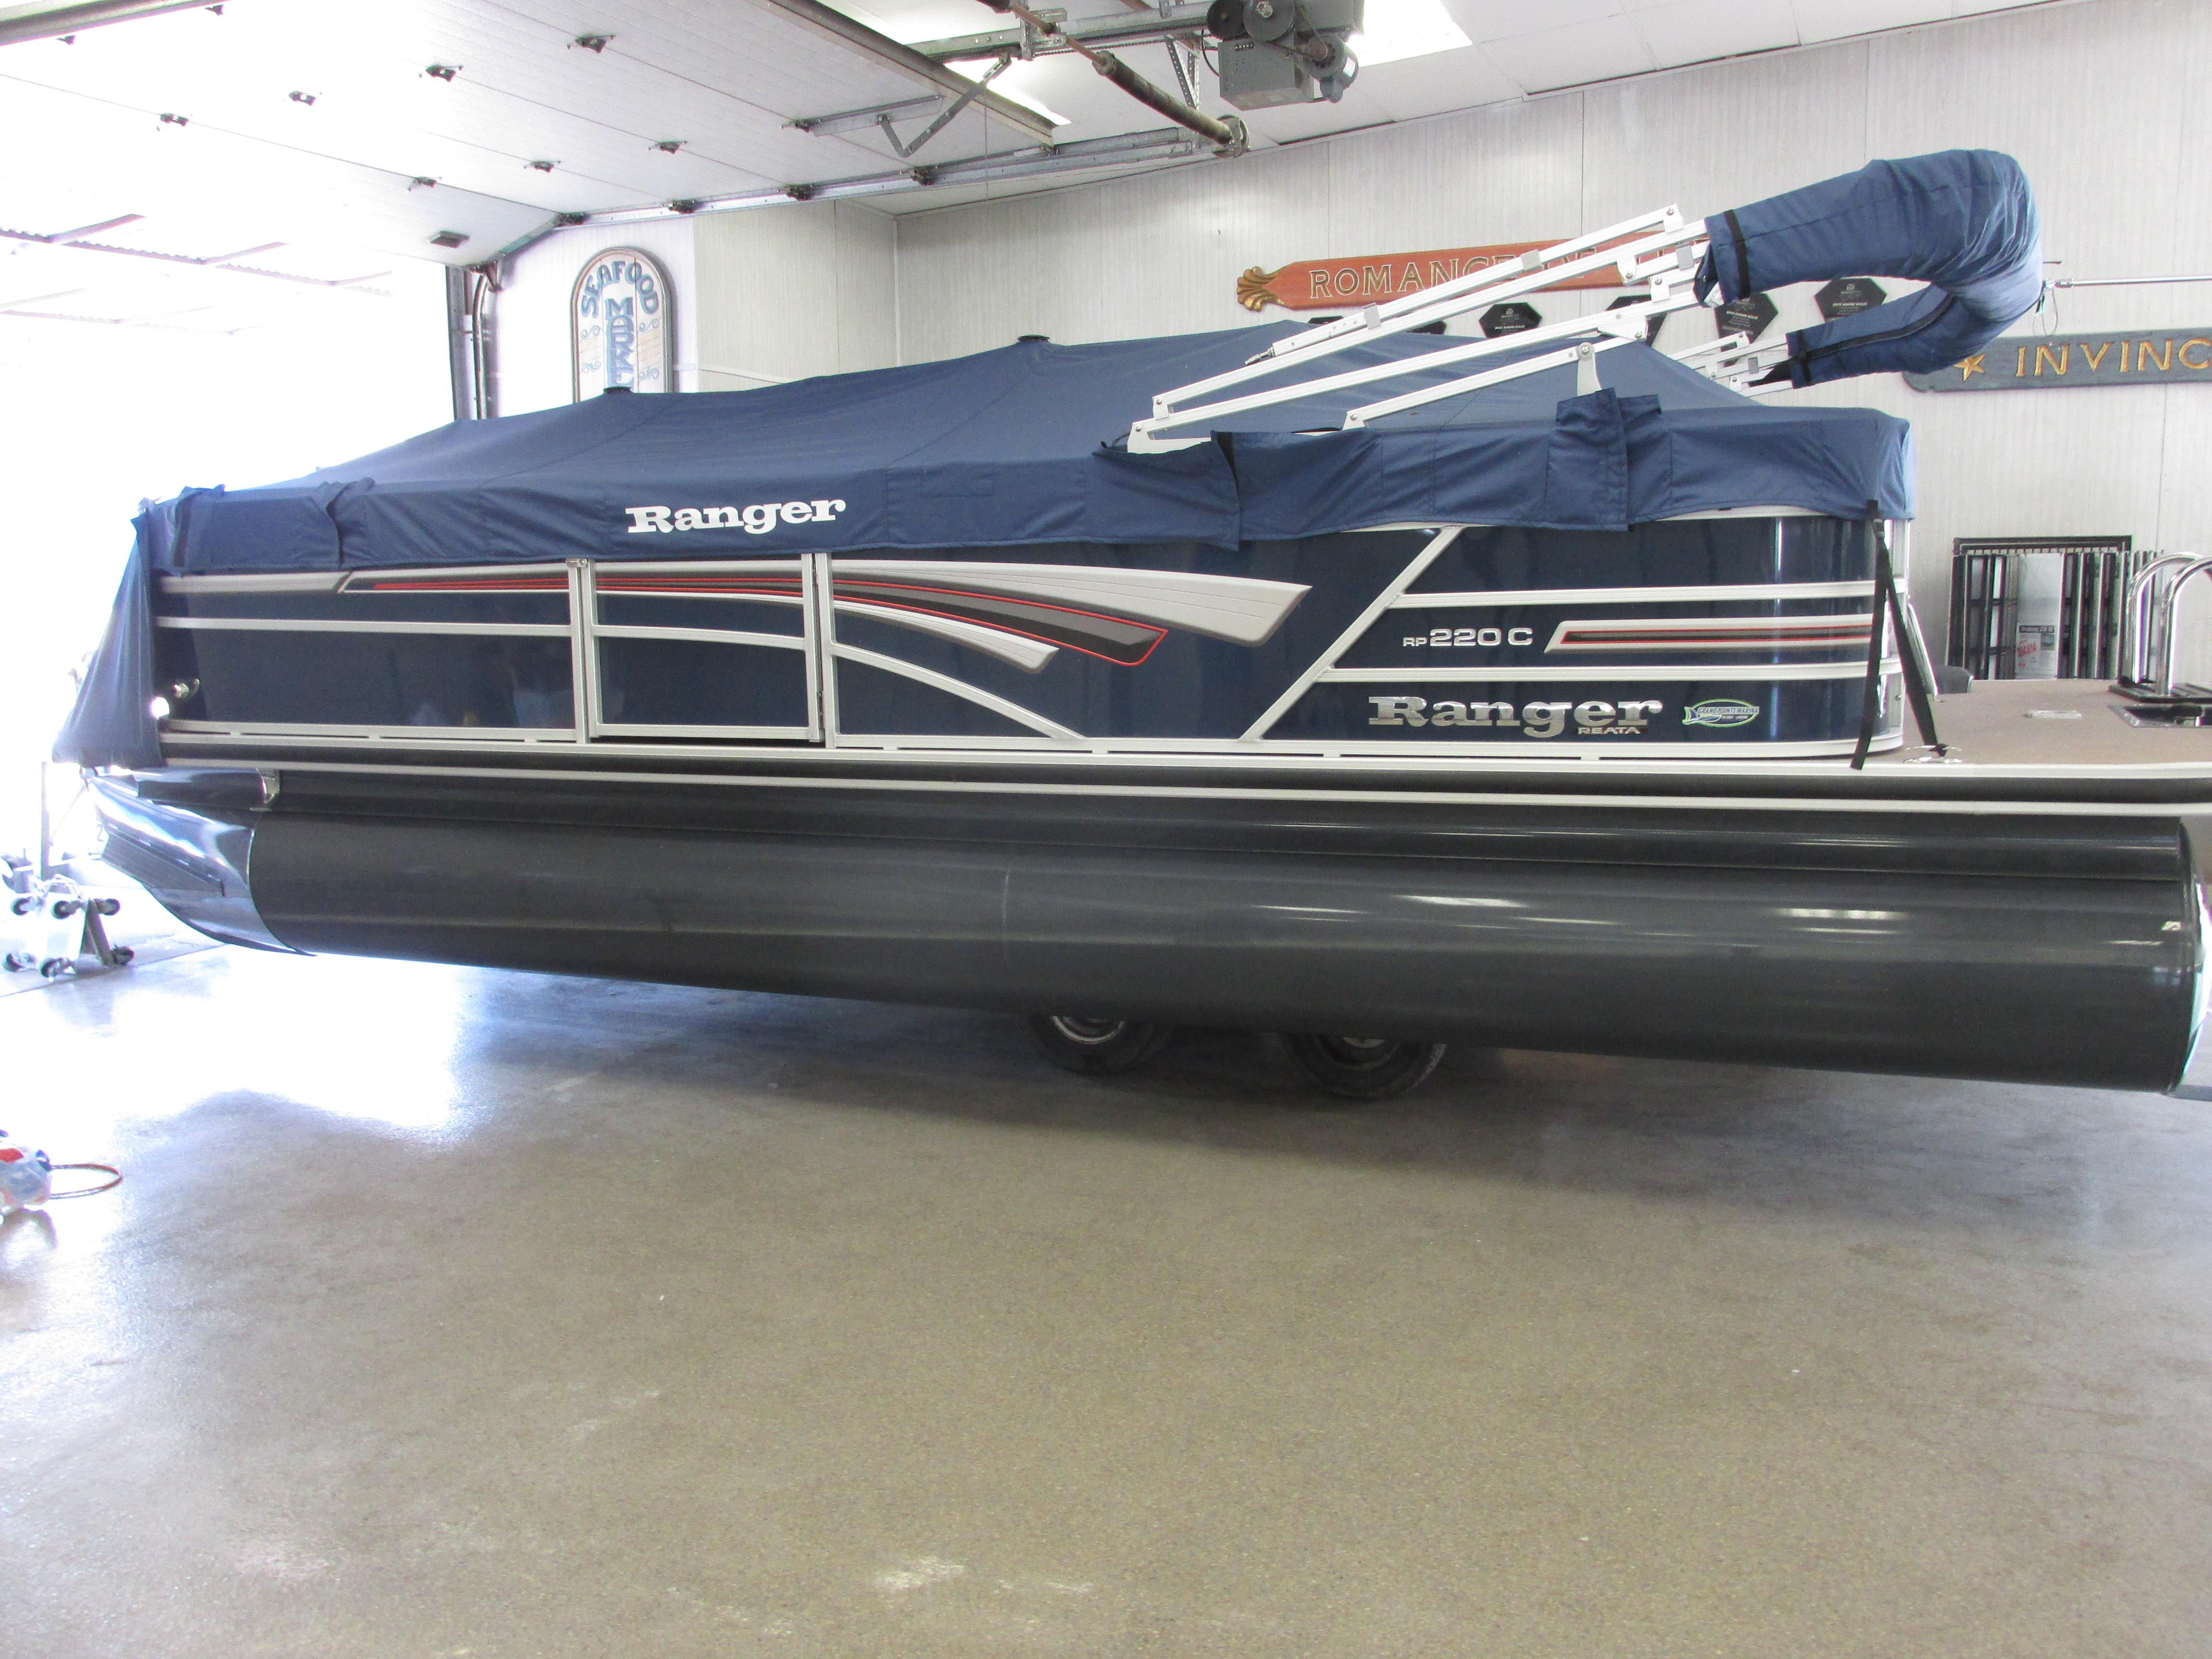 Ranger220 Cruise